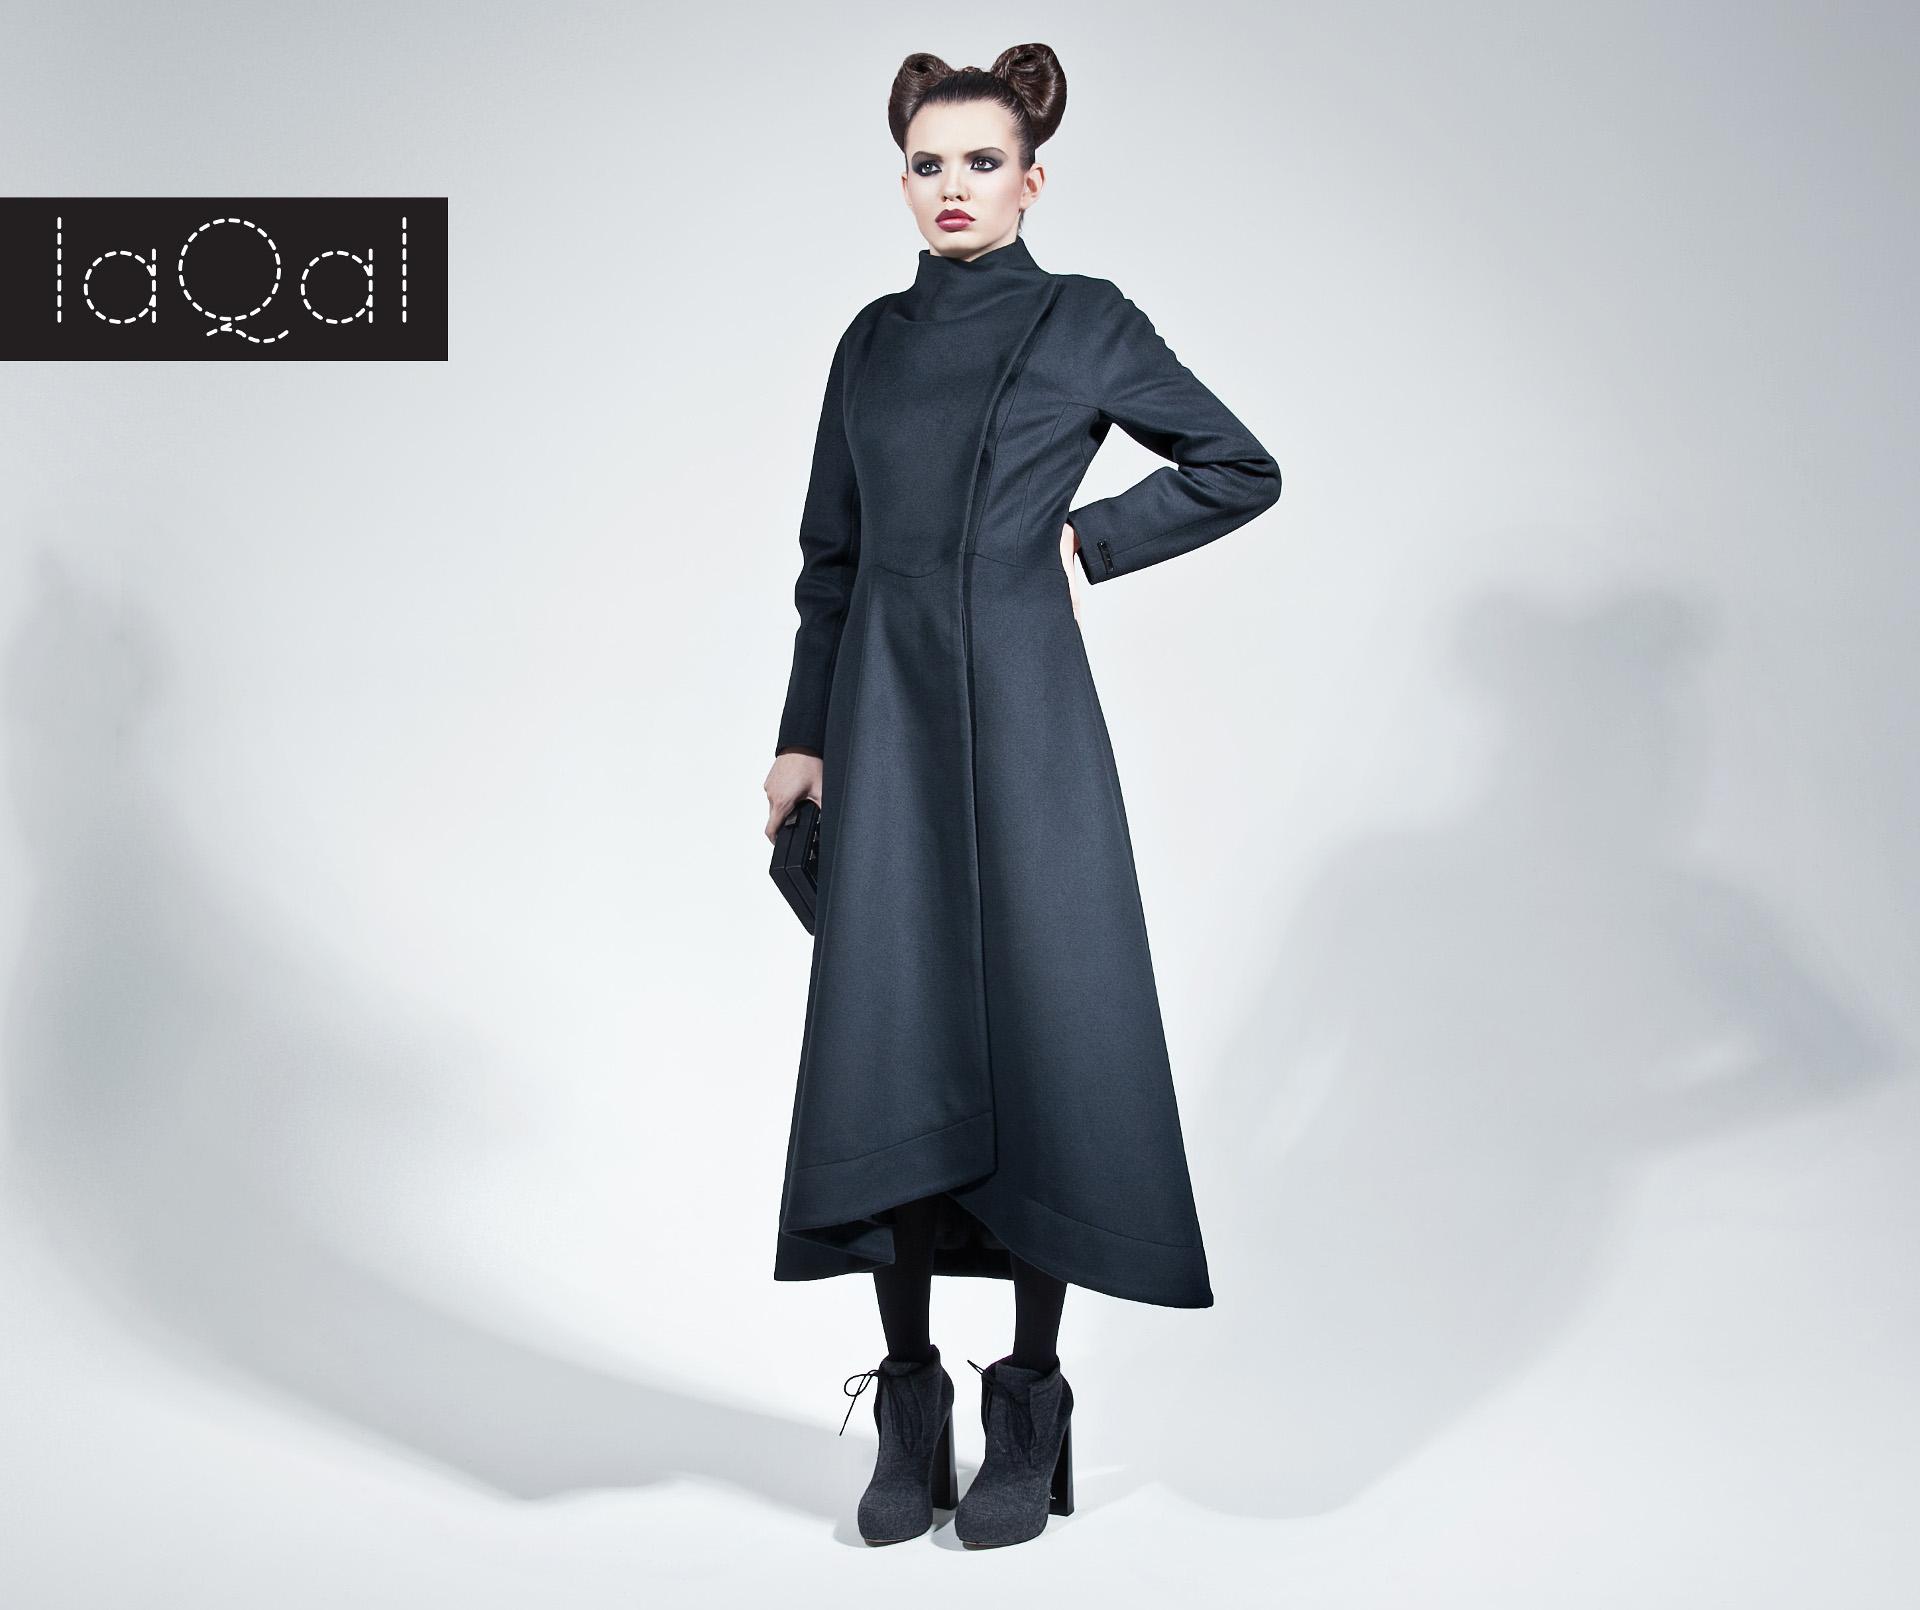 Creation of the logo для бренда clothes, Clothing brand logo design